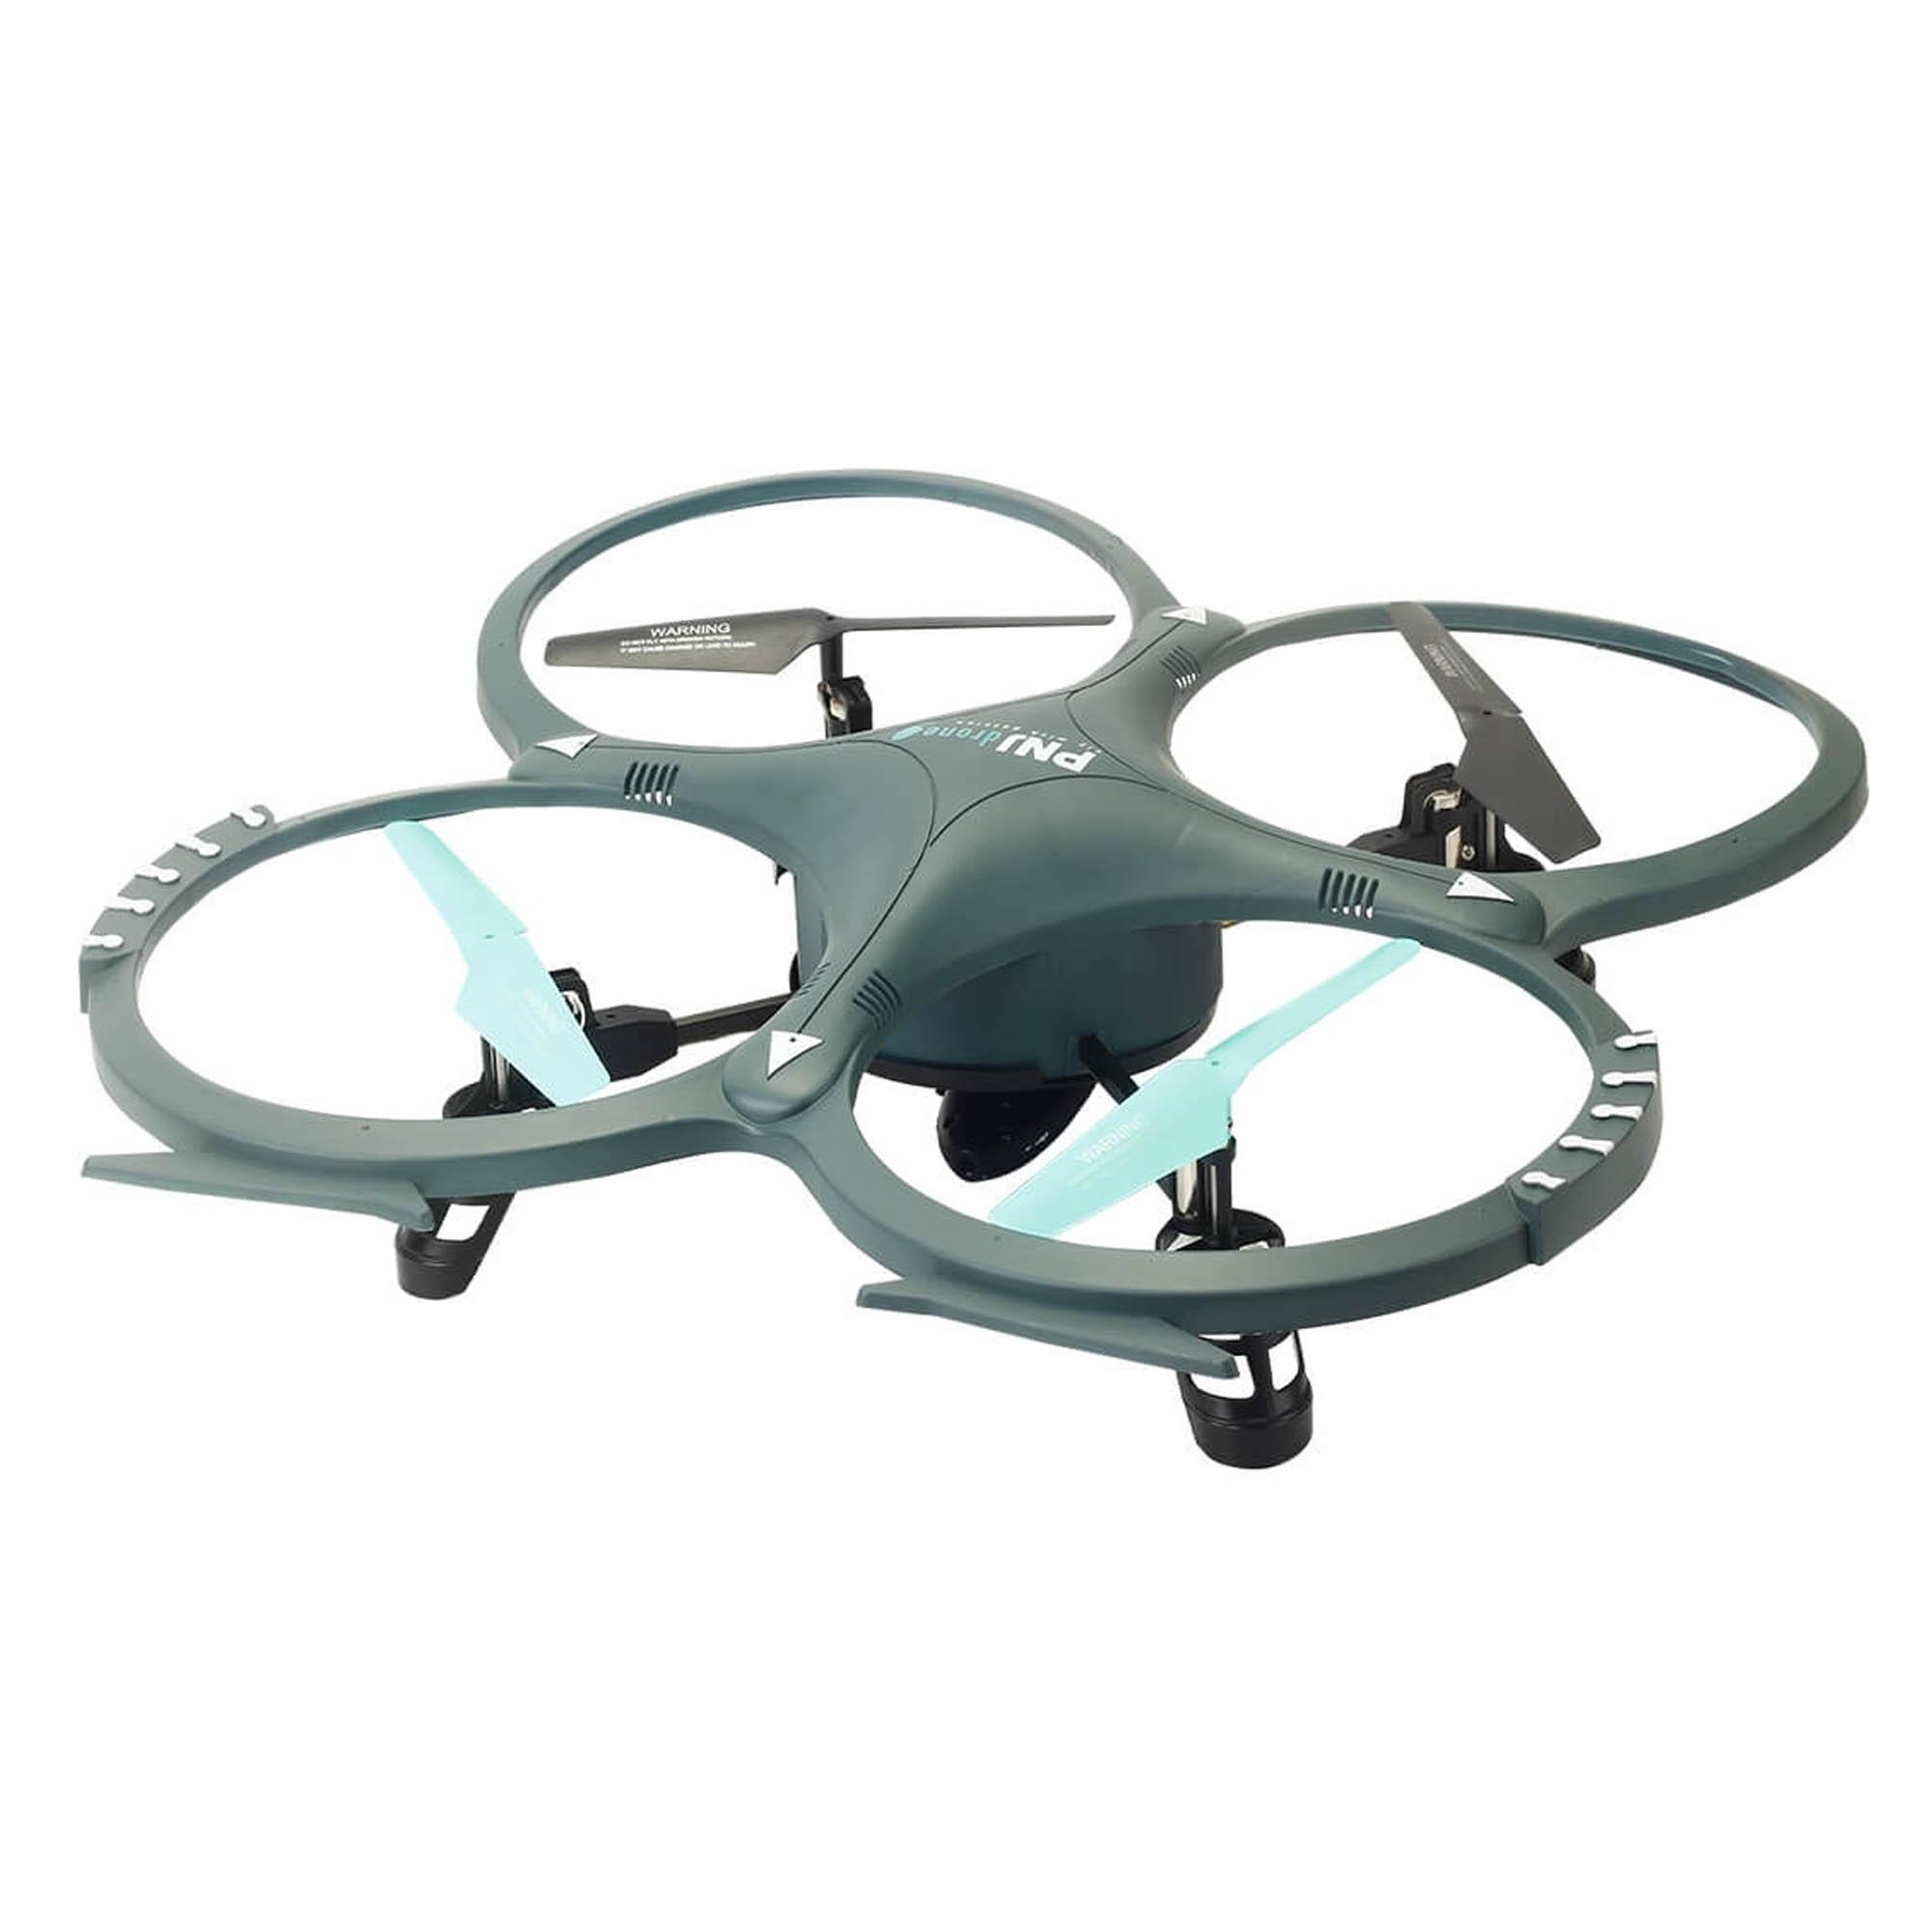 drone pnj